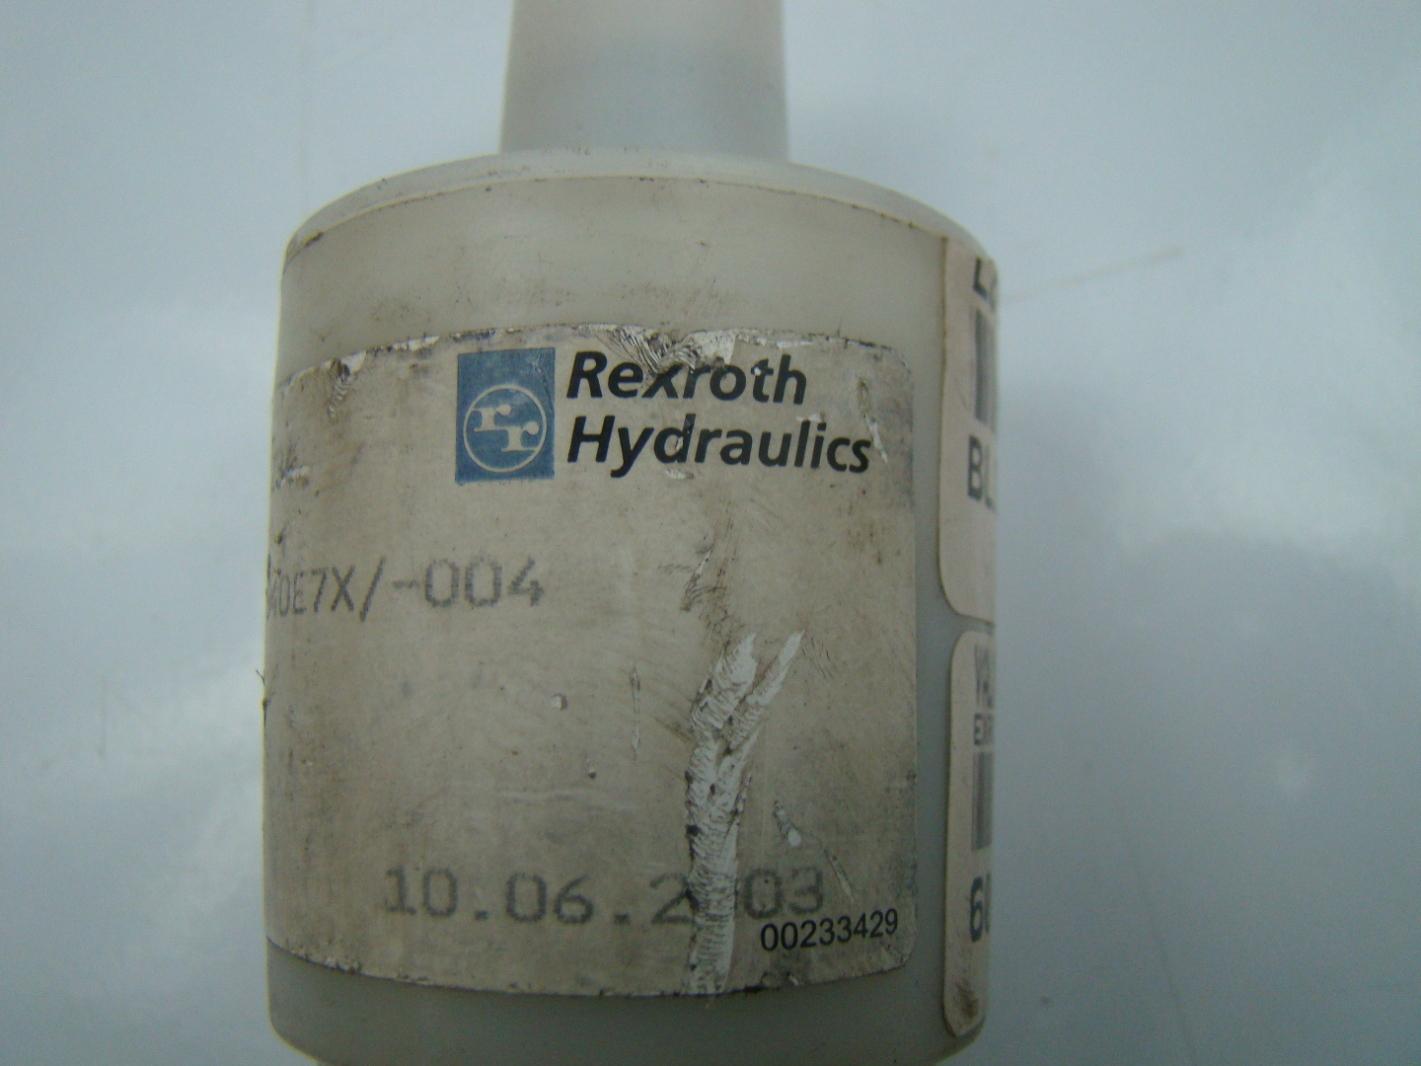 REXROTH HYDRAULICS 2 WAY CARTRIDGE VALVE LC 25 DB40E7X/004